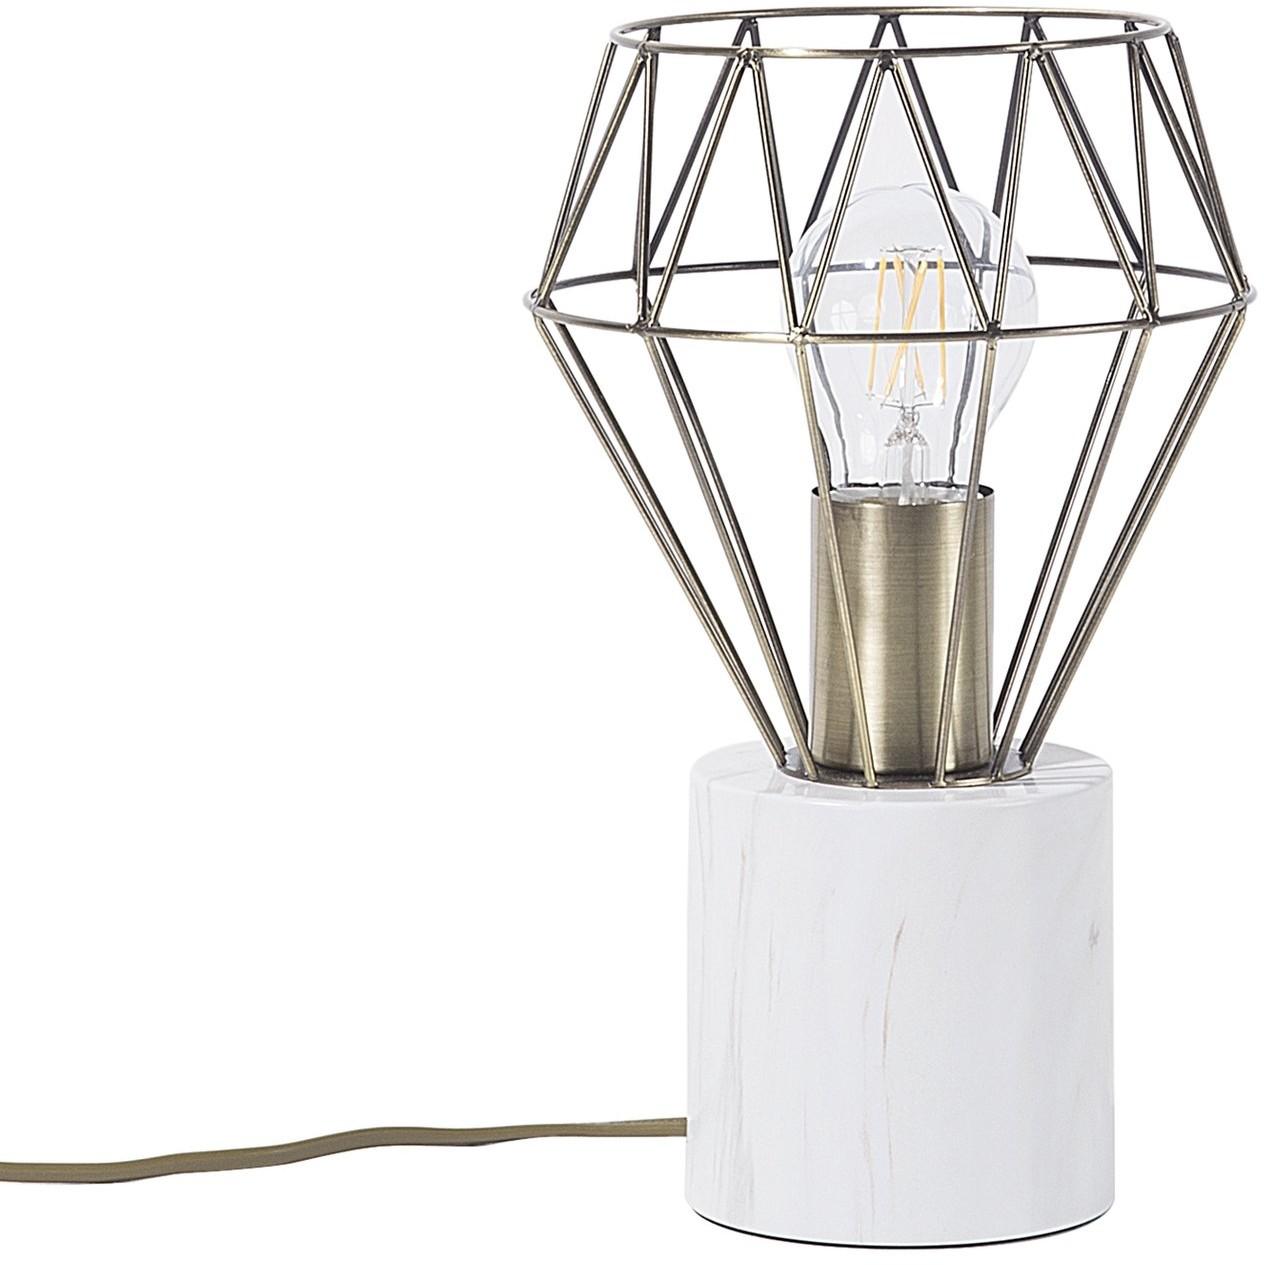 Beliani Lampa stołowa mosiężna MOONI mała